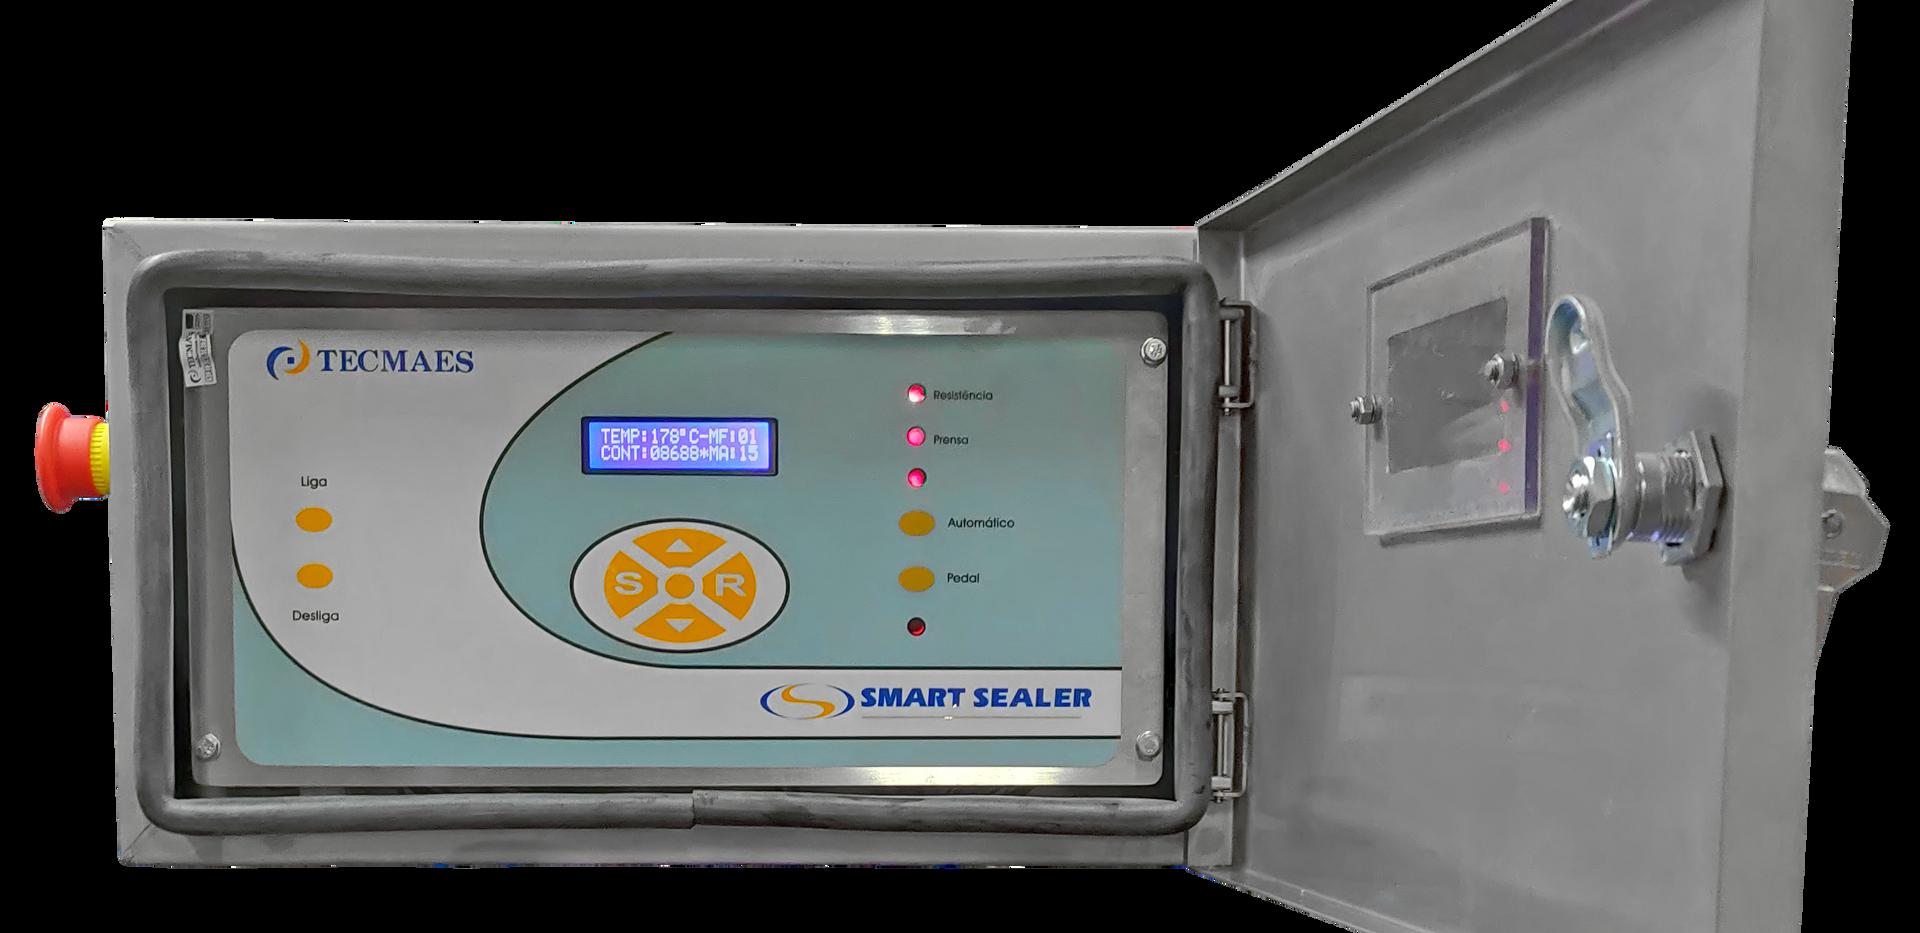 Smart Sealer Painel aberto.png